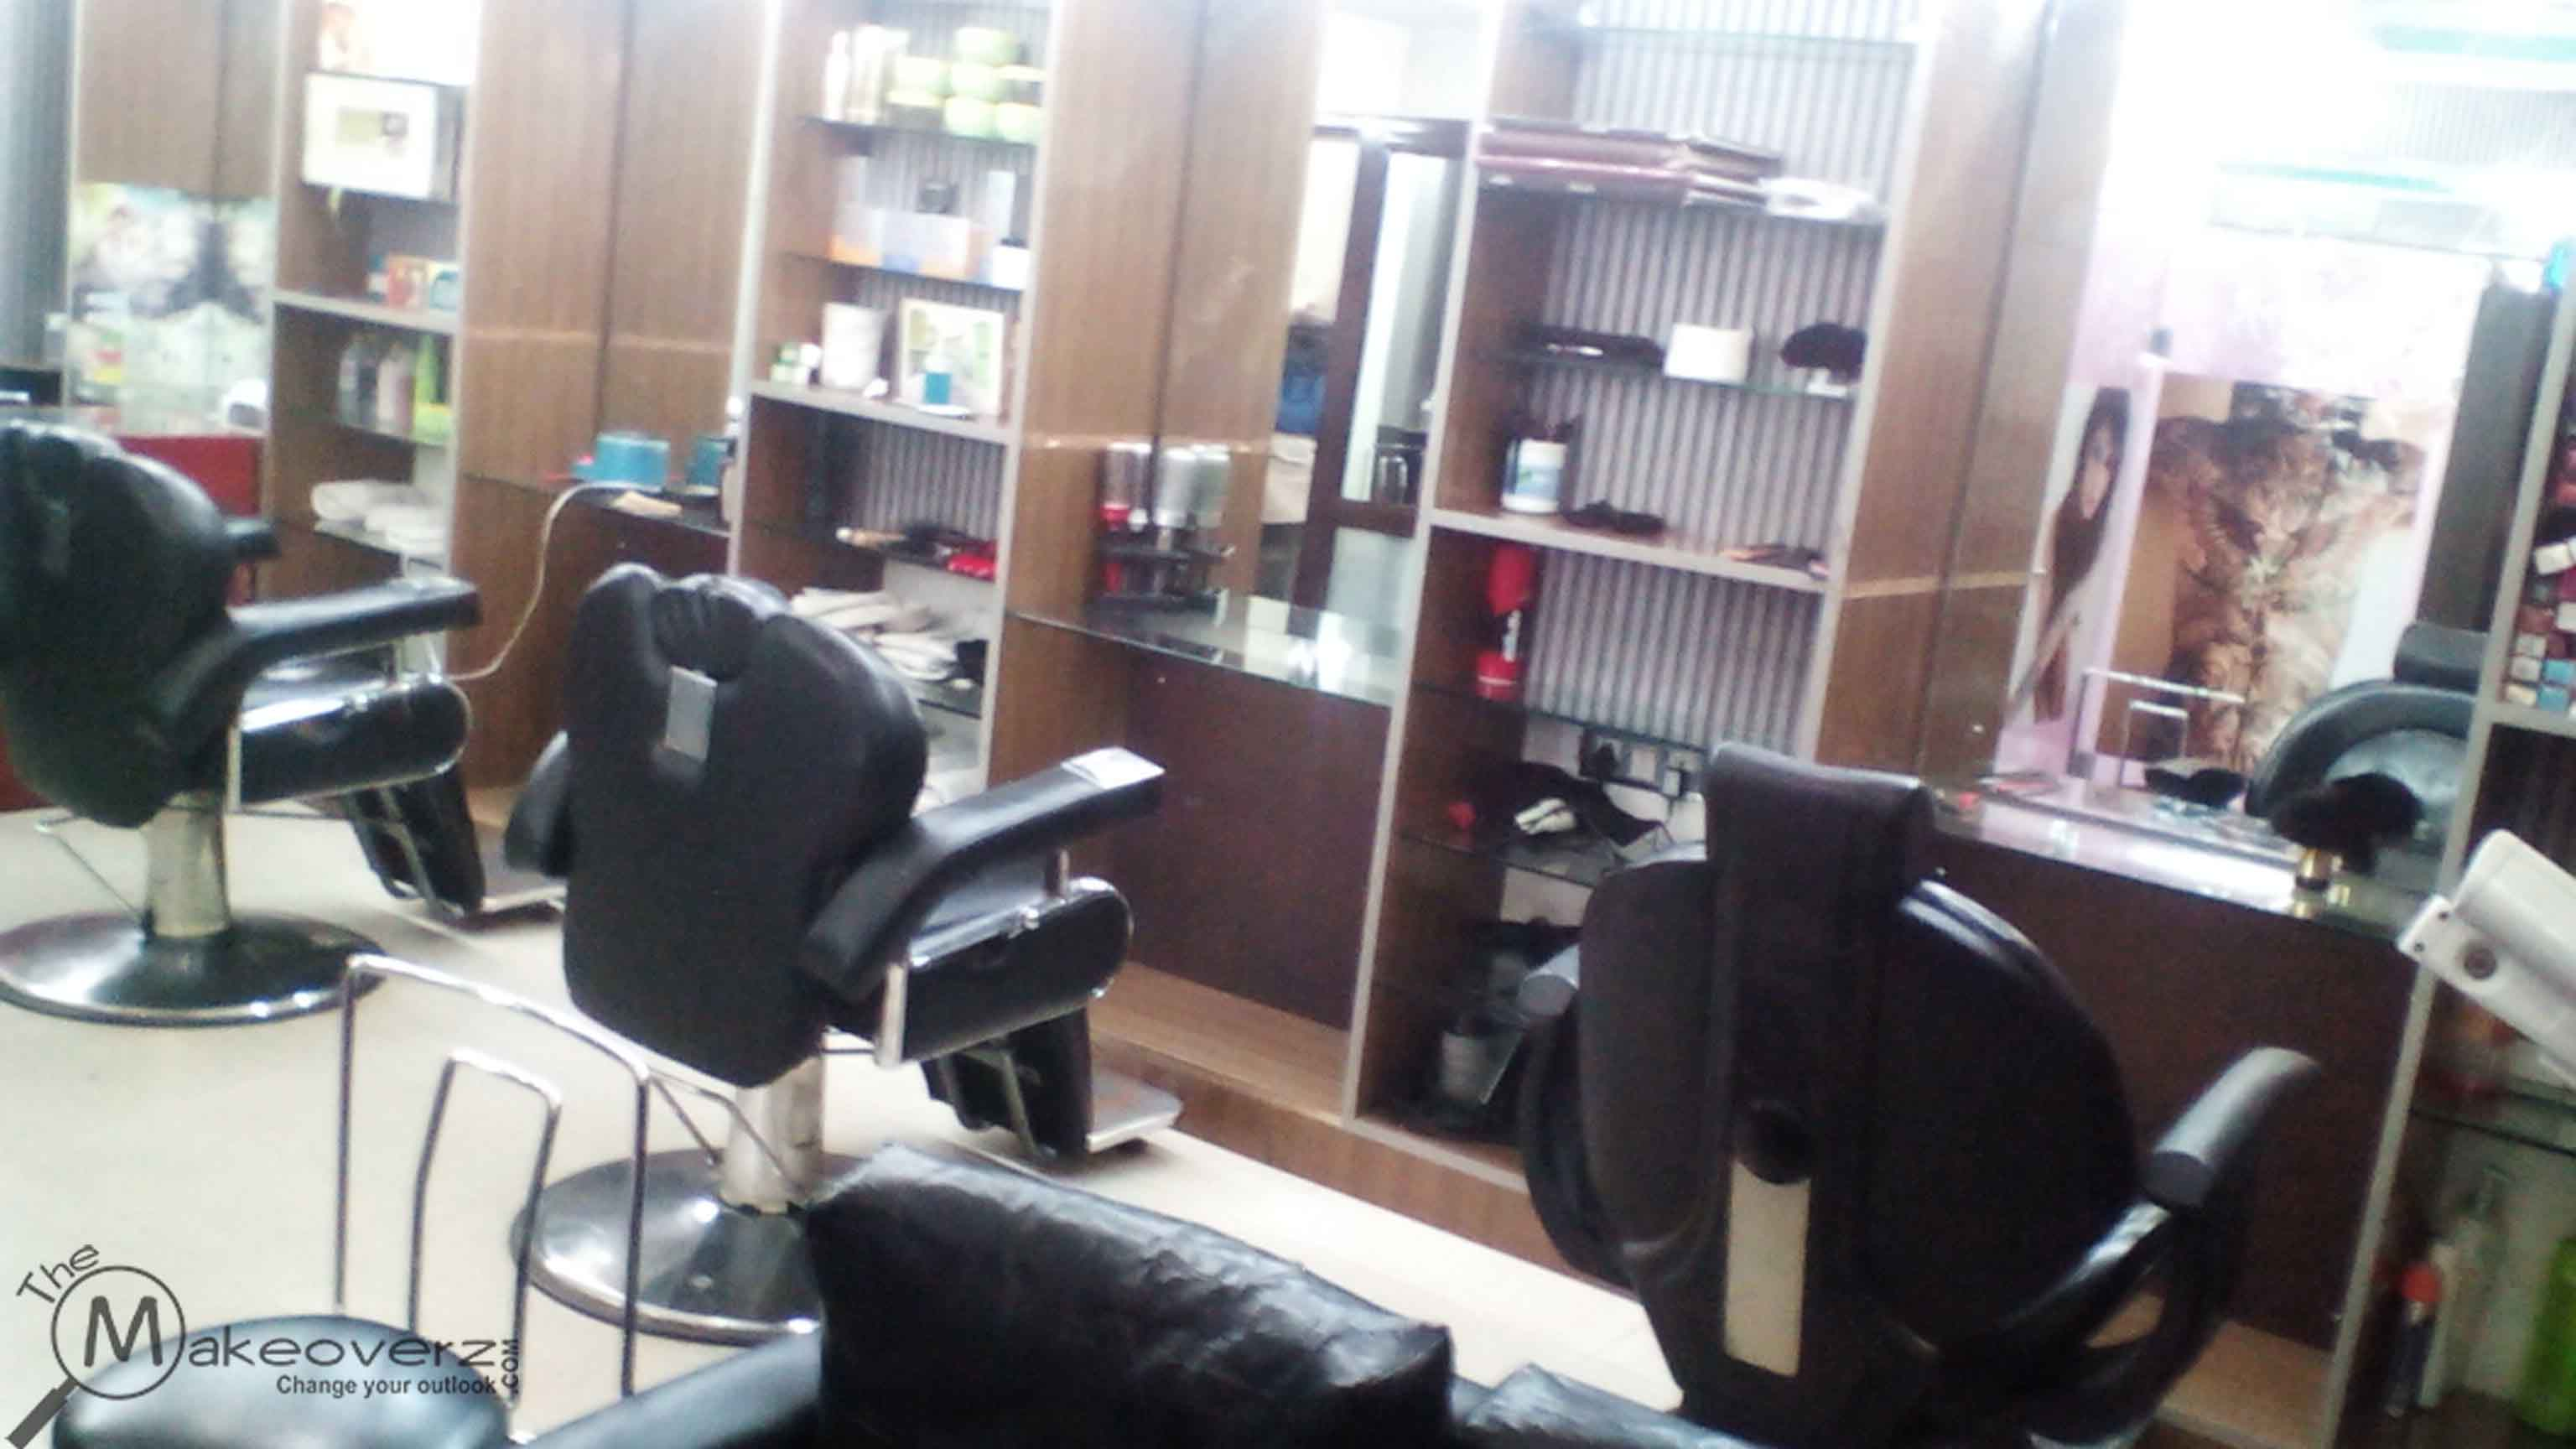 kropp salon - sector 56